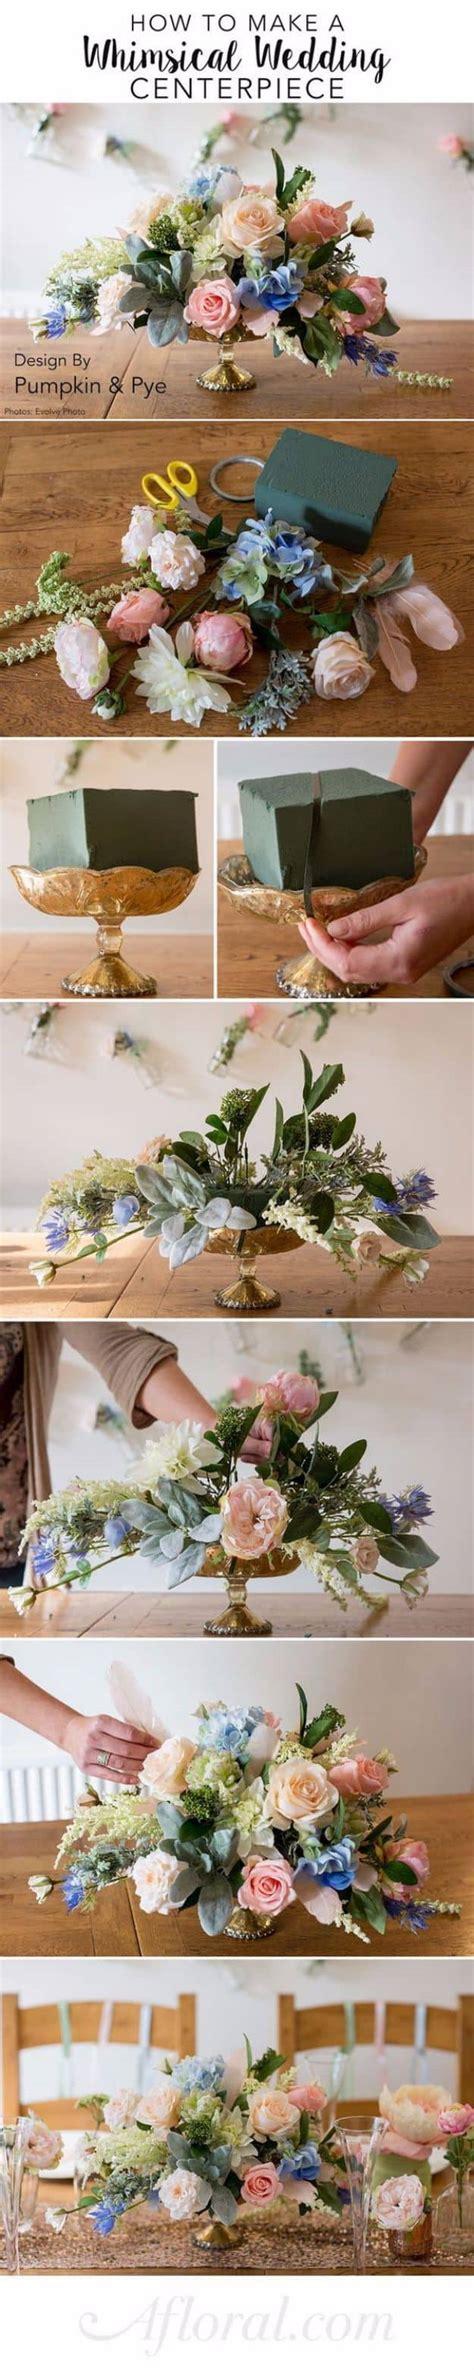 12 inspiring diy wedding centerpieces on a budget cute